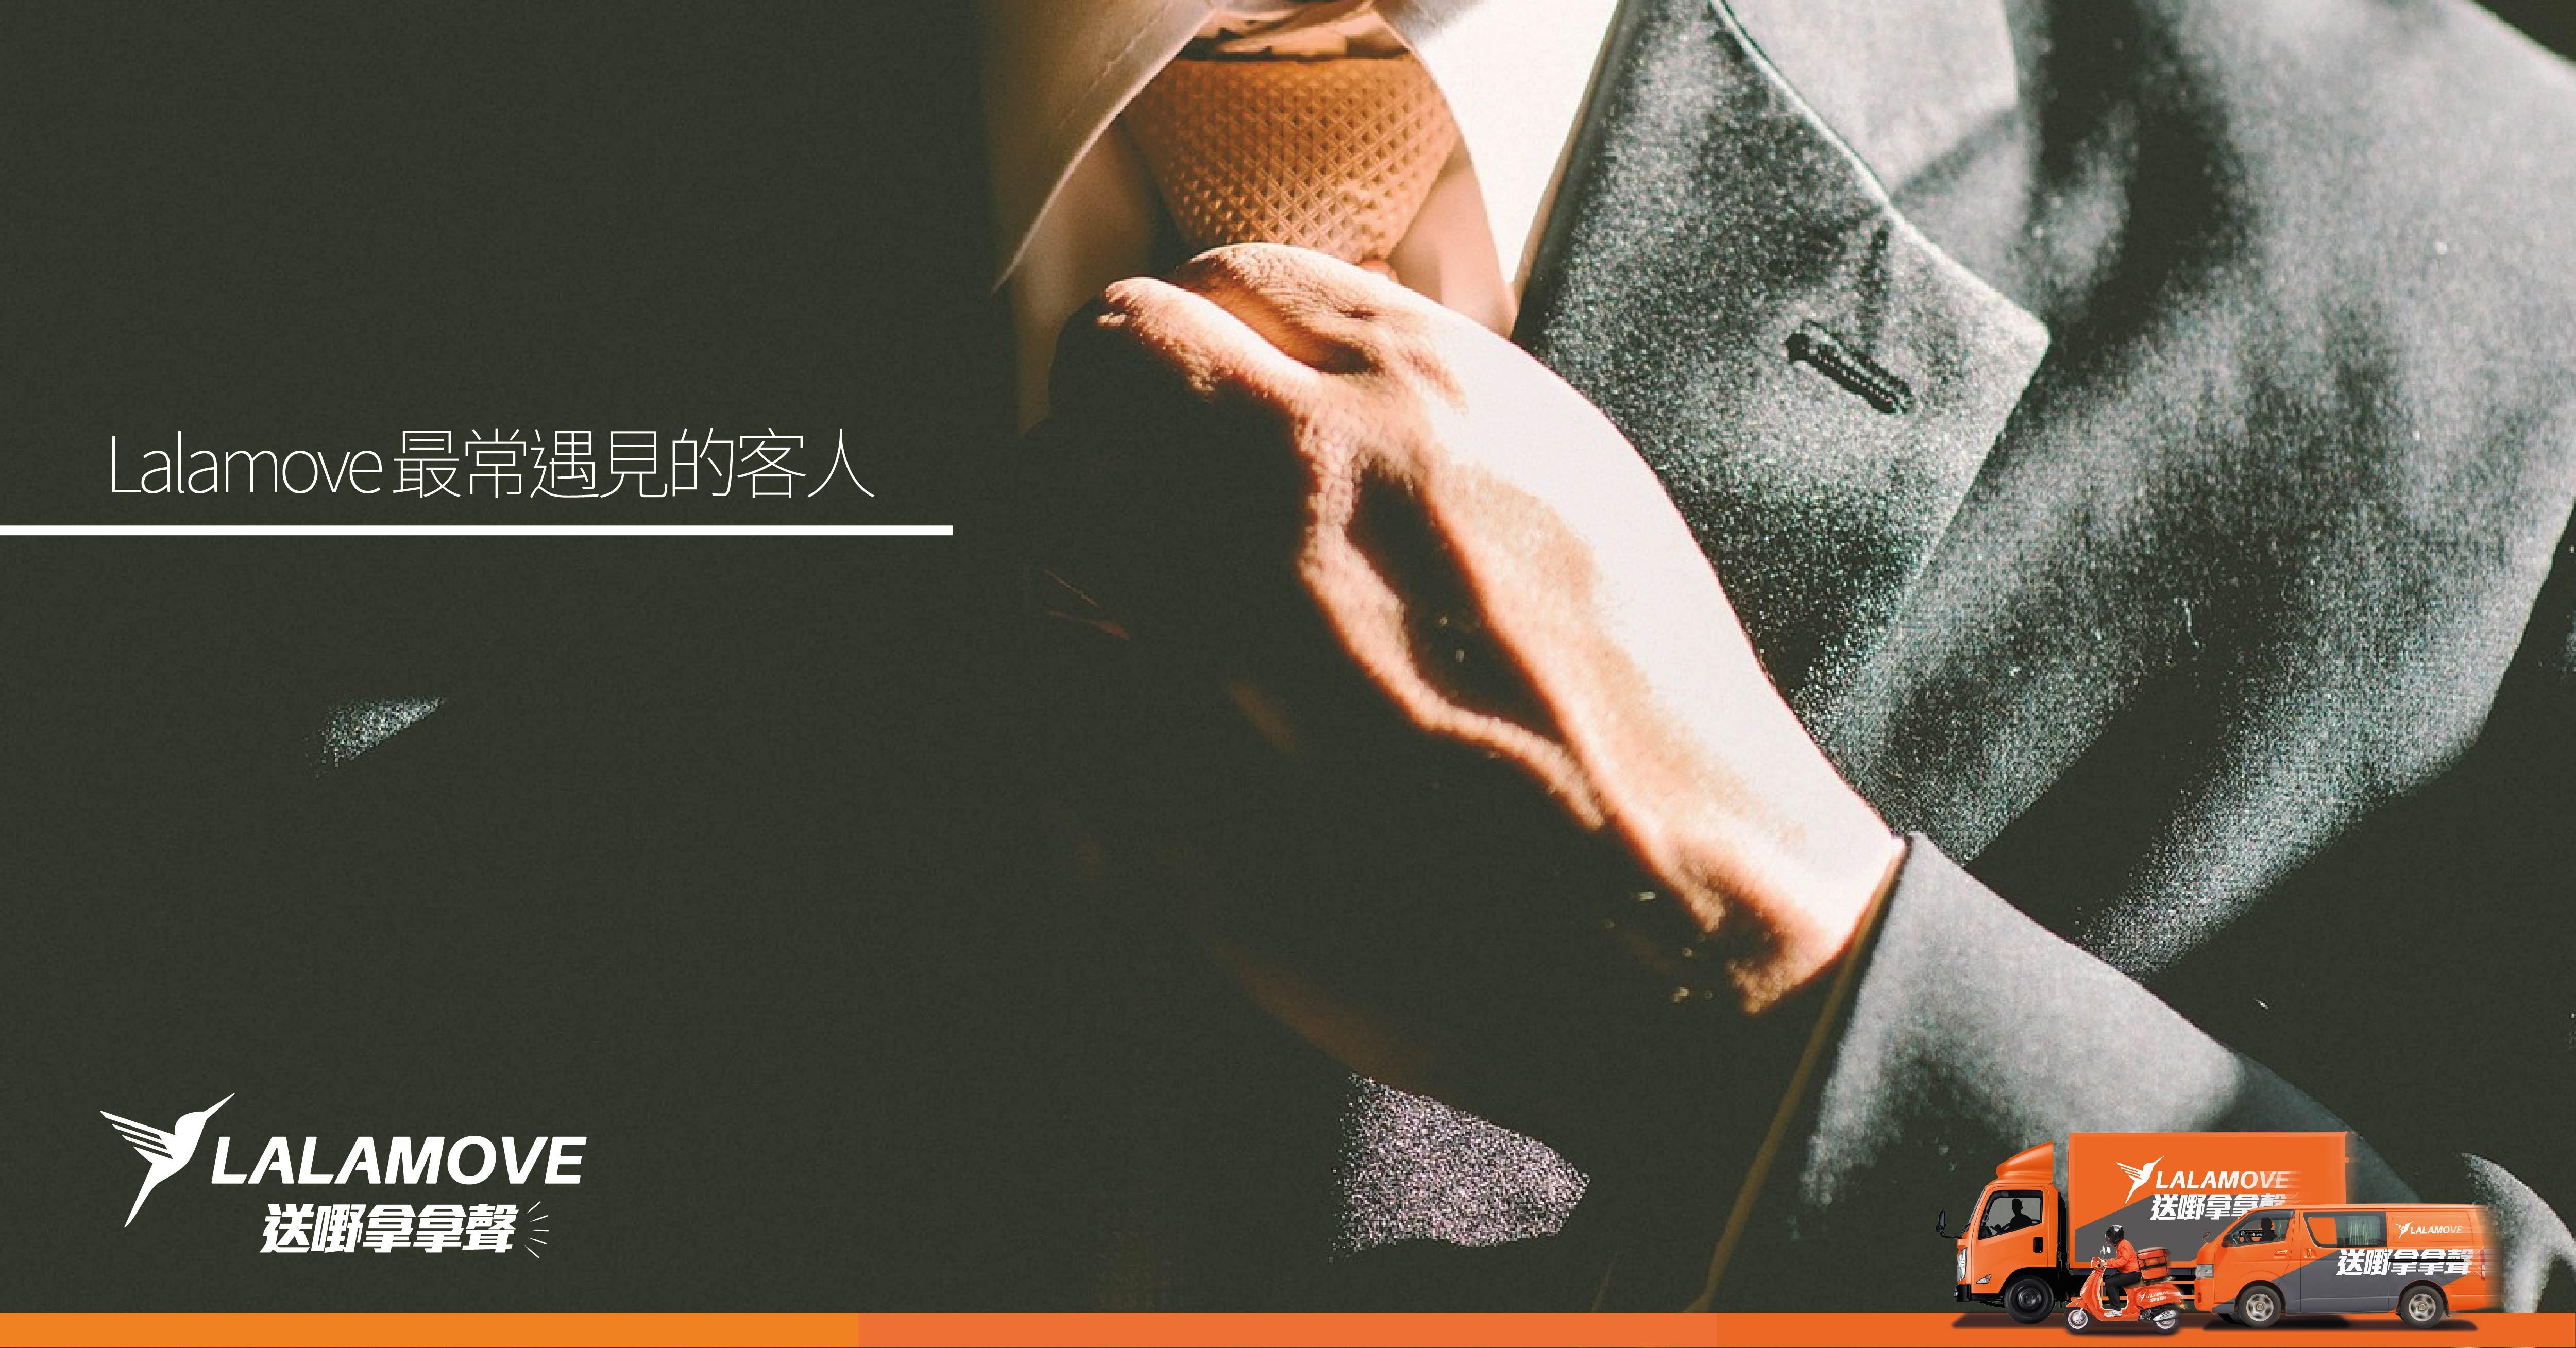 HK_Blog_dog_customer_20180620-01